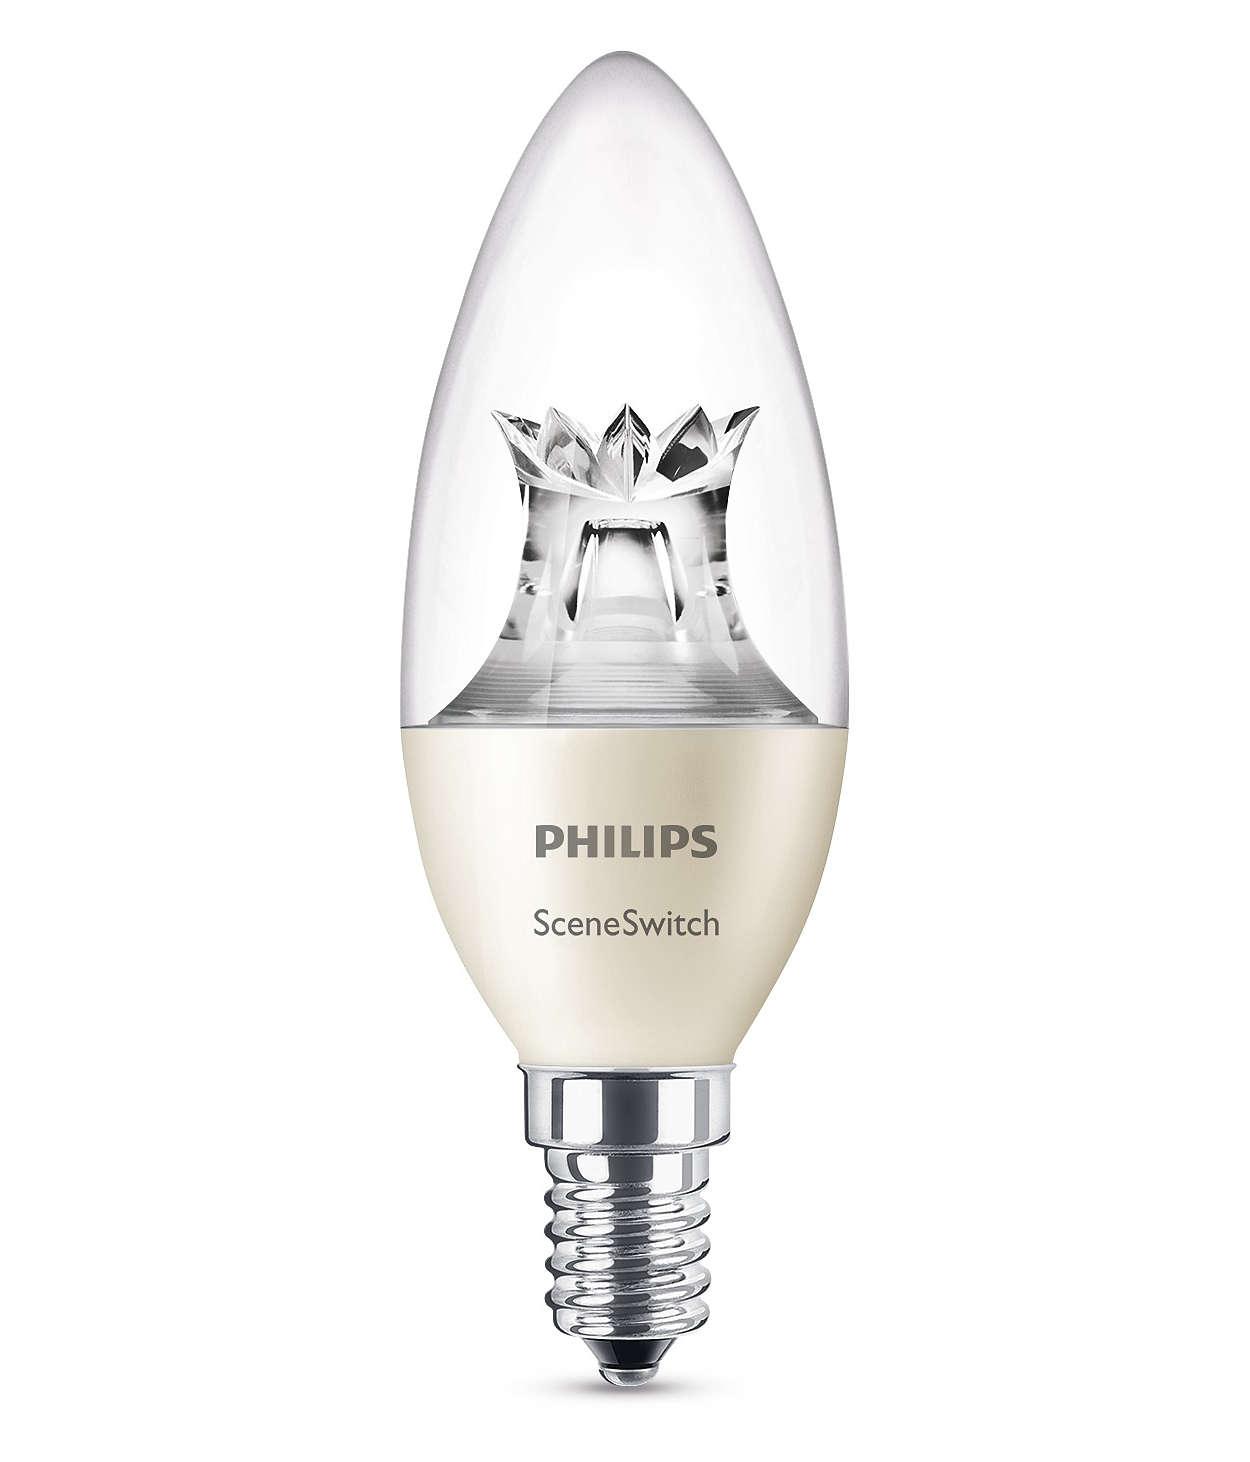 Eén kaarslamp, drie lichtinstellingen